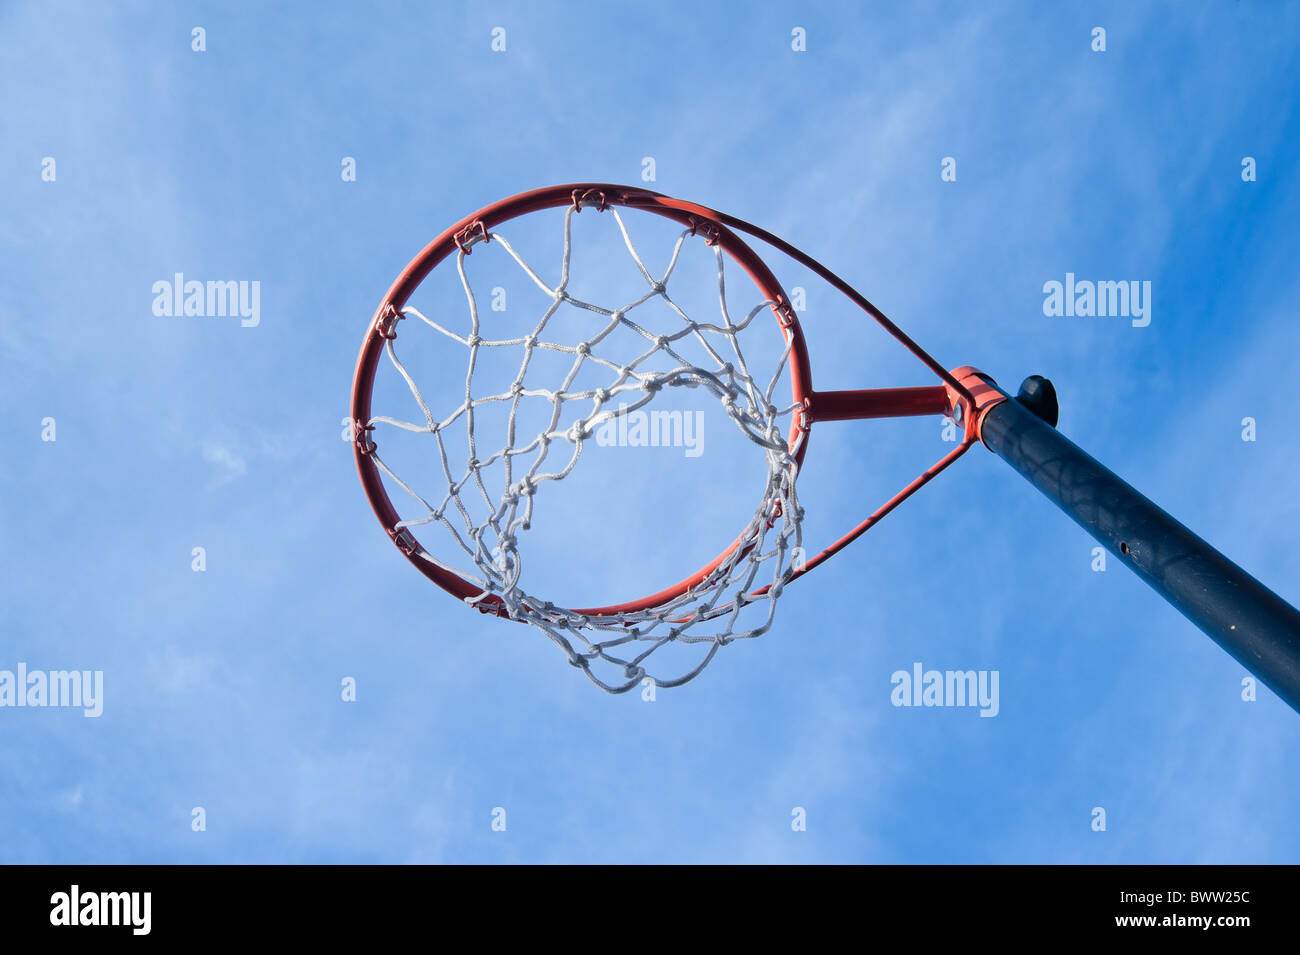 Aro de Netball Imagen De Stock